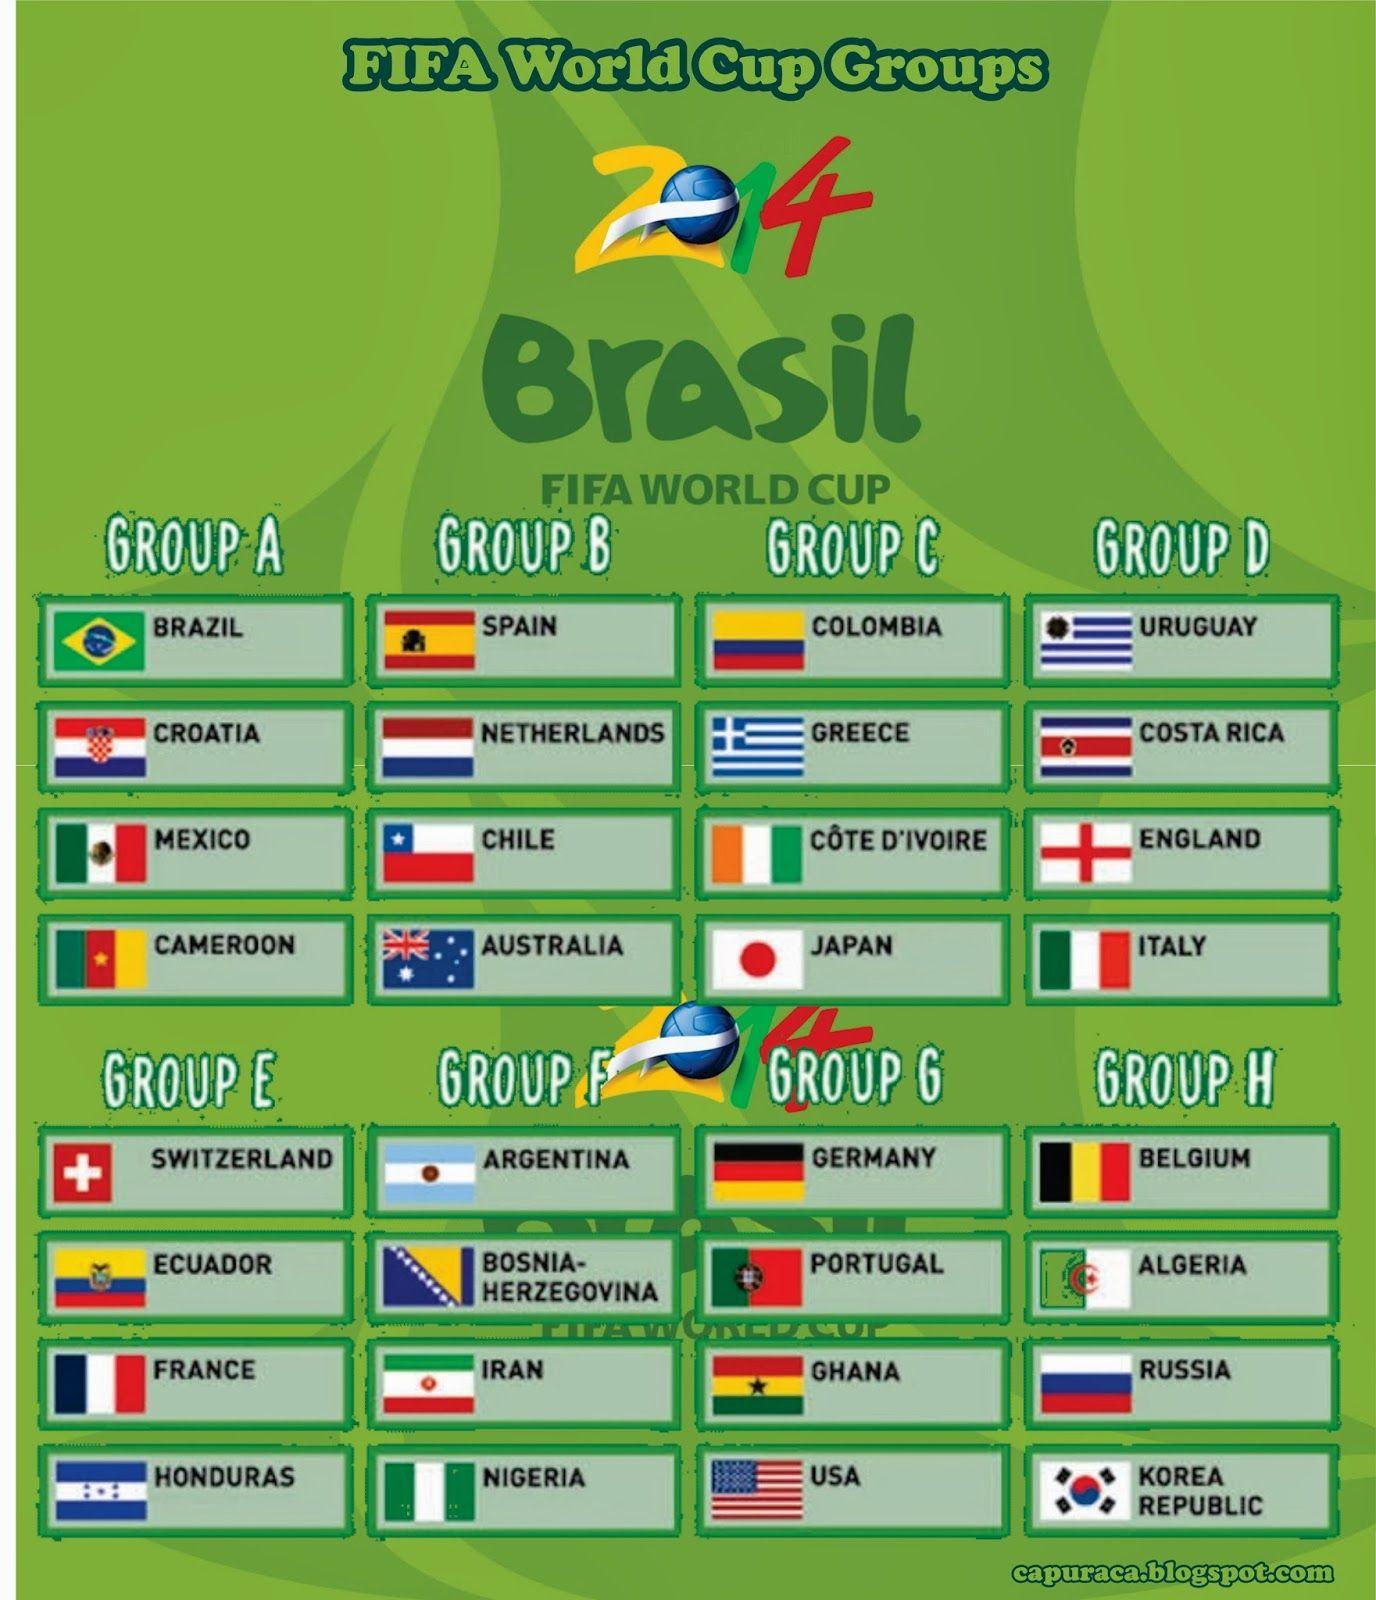 Chapuracha 2014 Fifa World Cup Groups And Game Schedules Fifa World Cup 2014 Copa Do Mundo Fifa